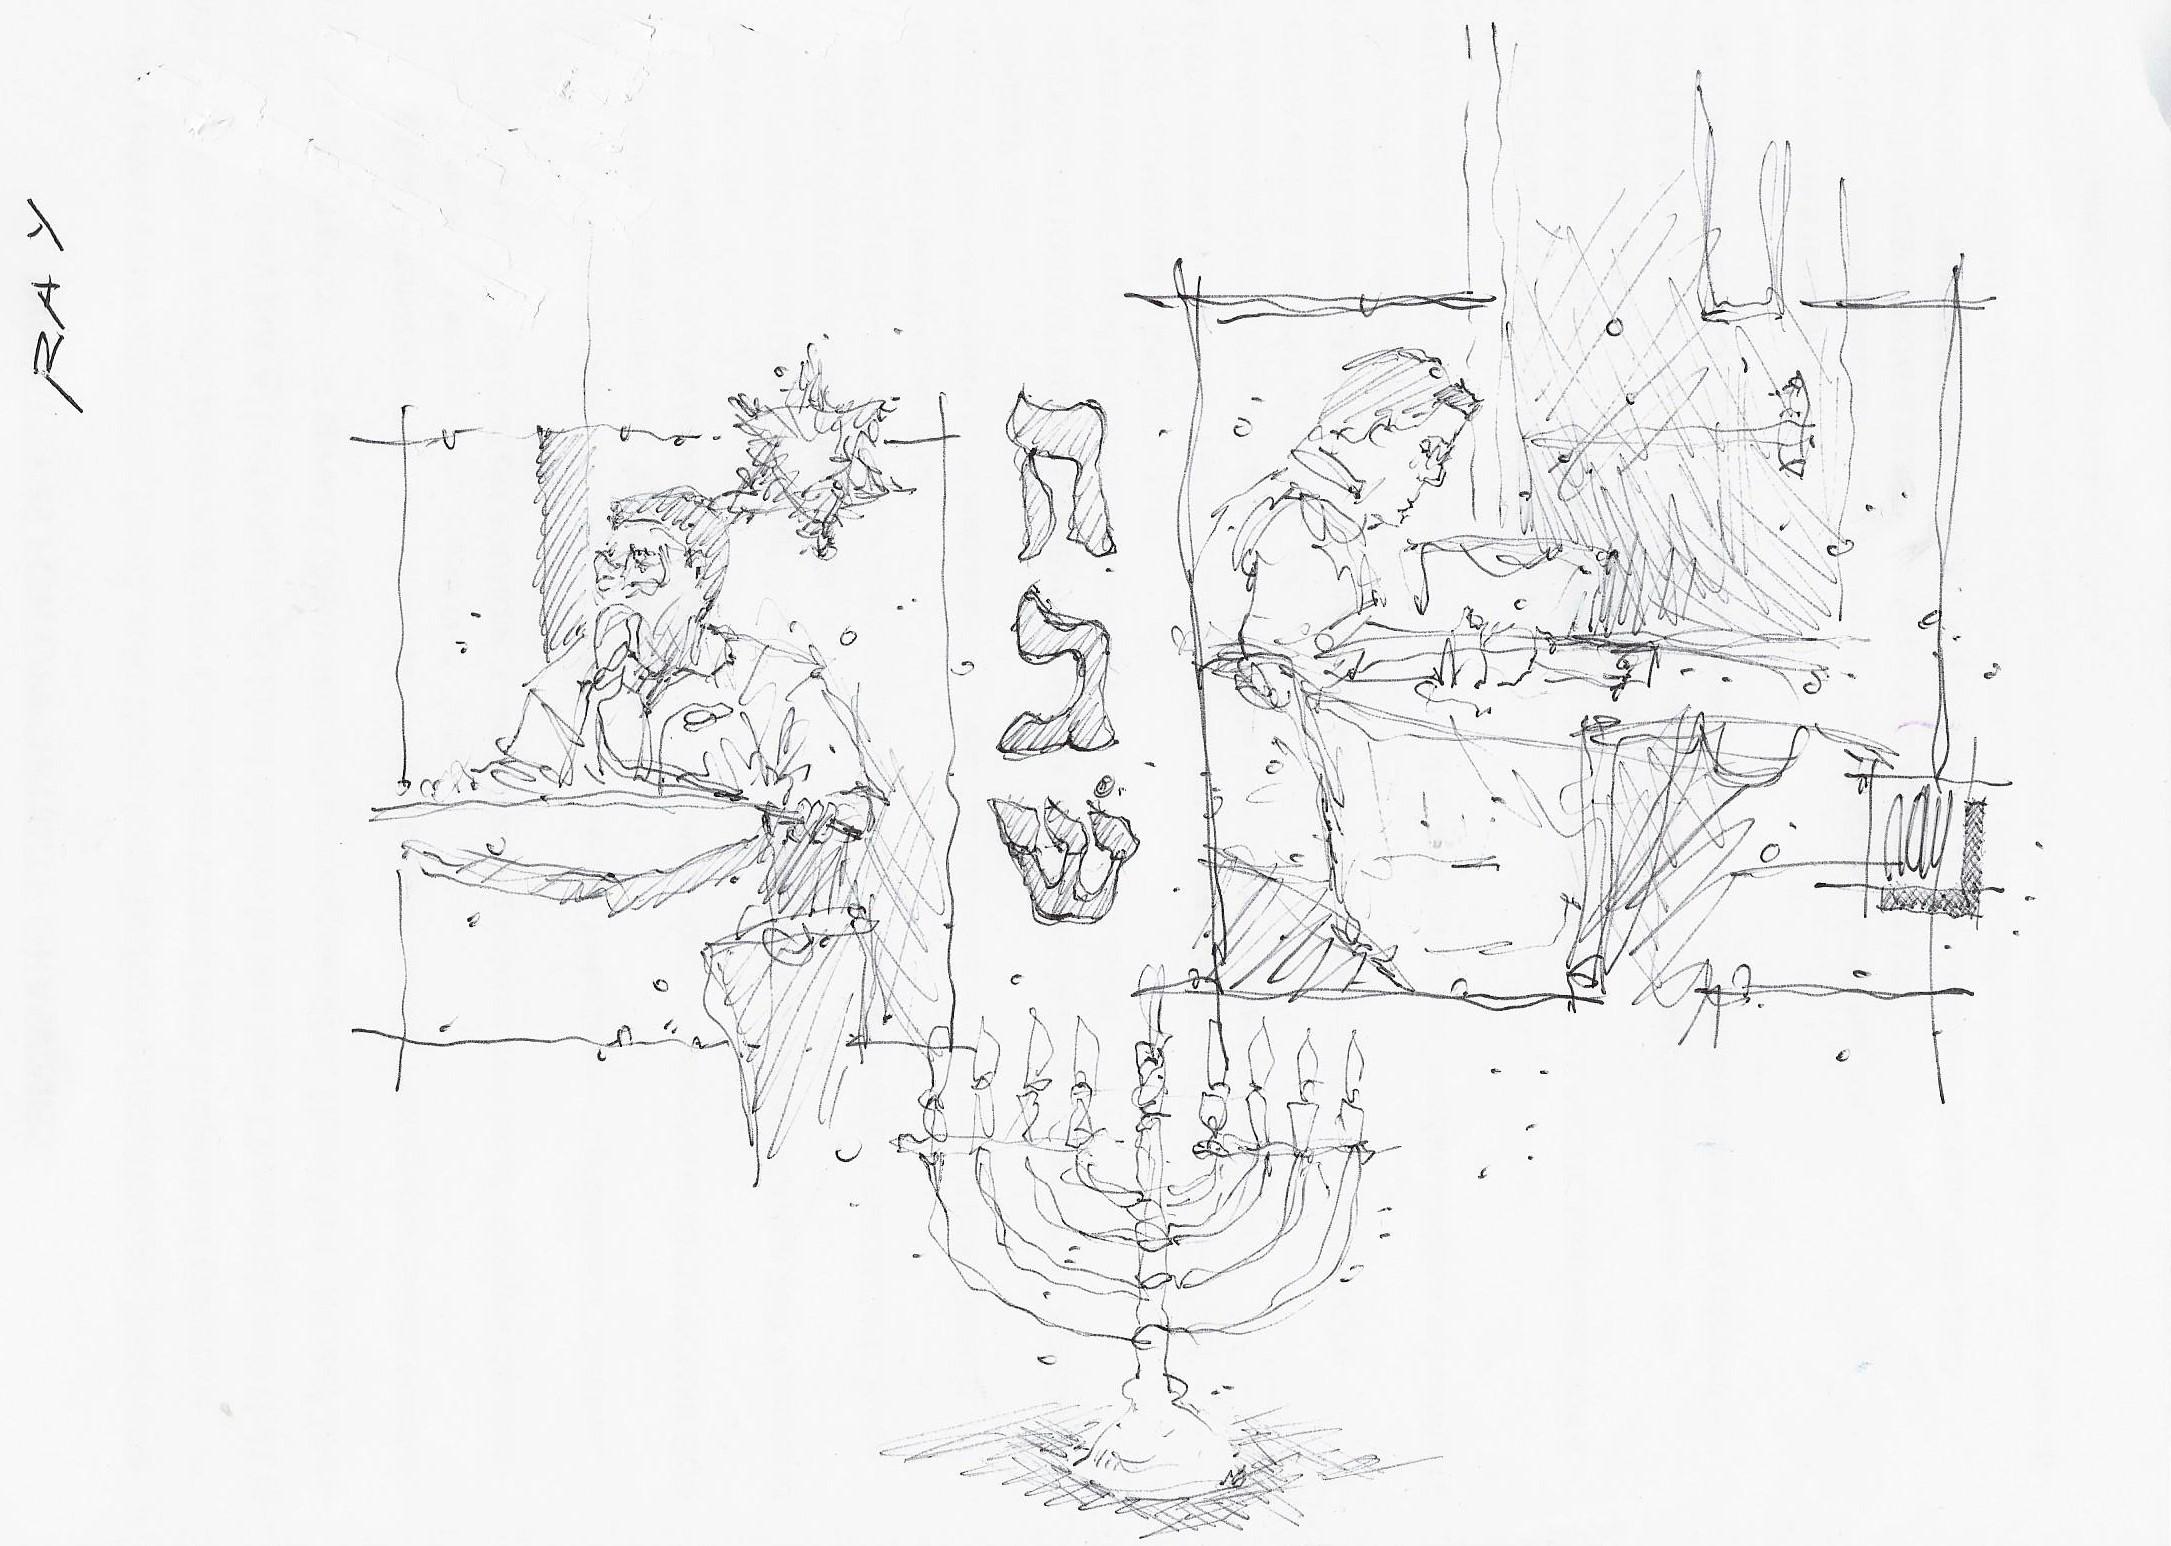 Rays sketch of Robb (2).jpg